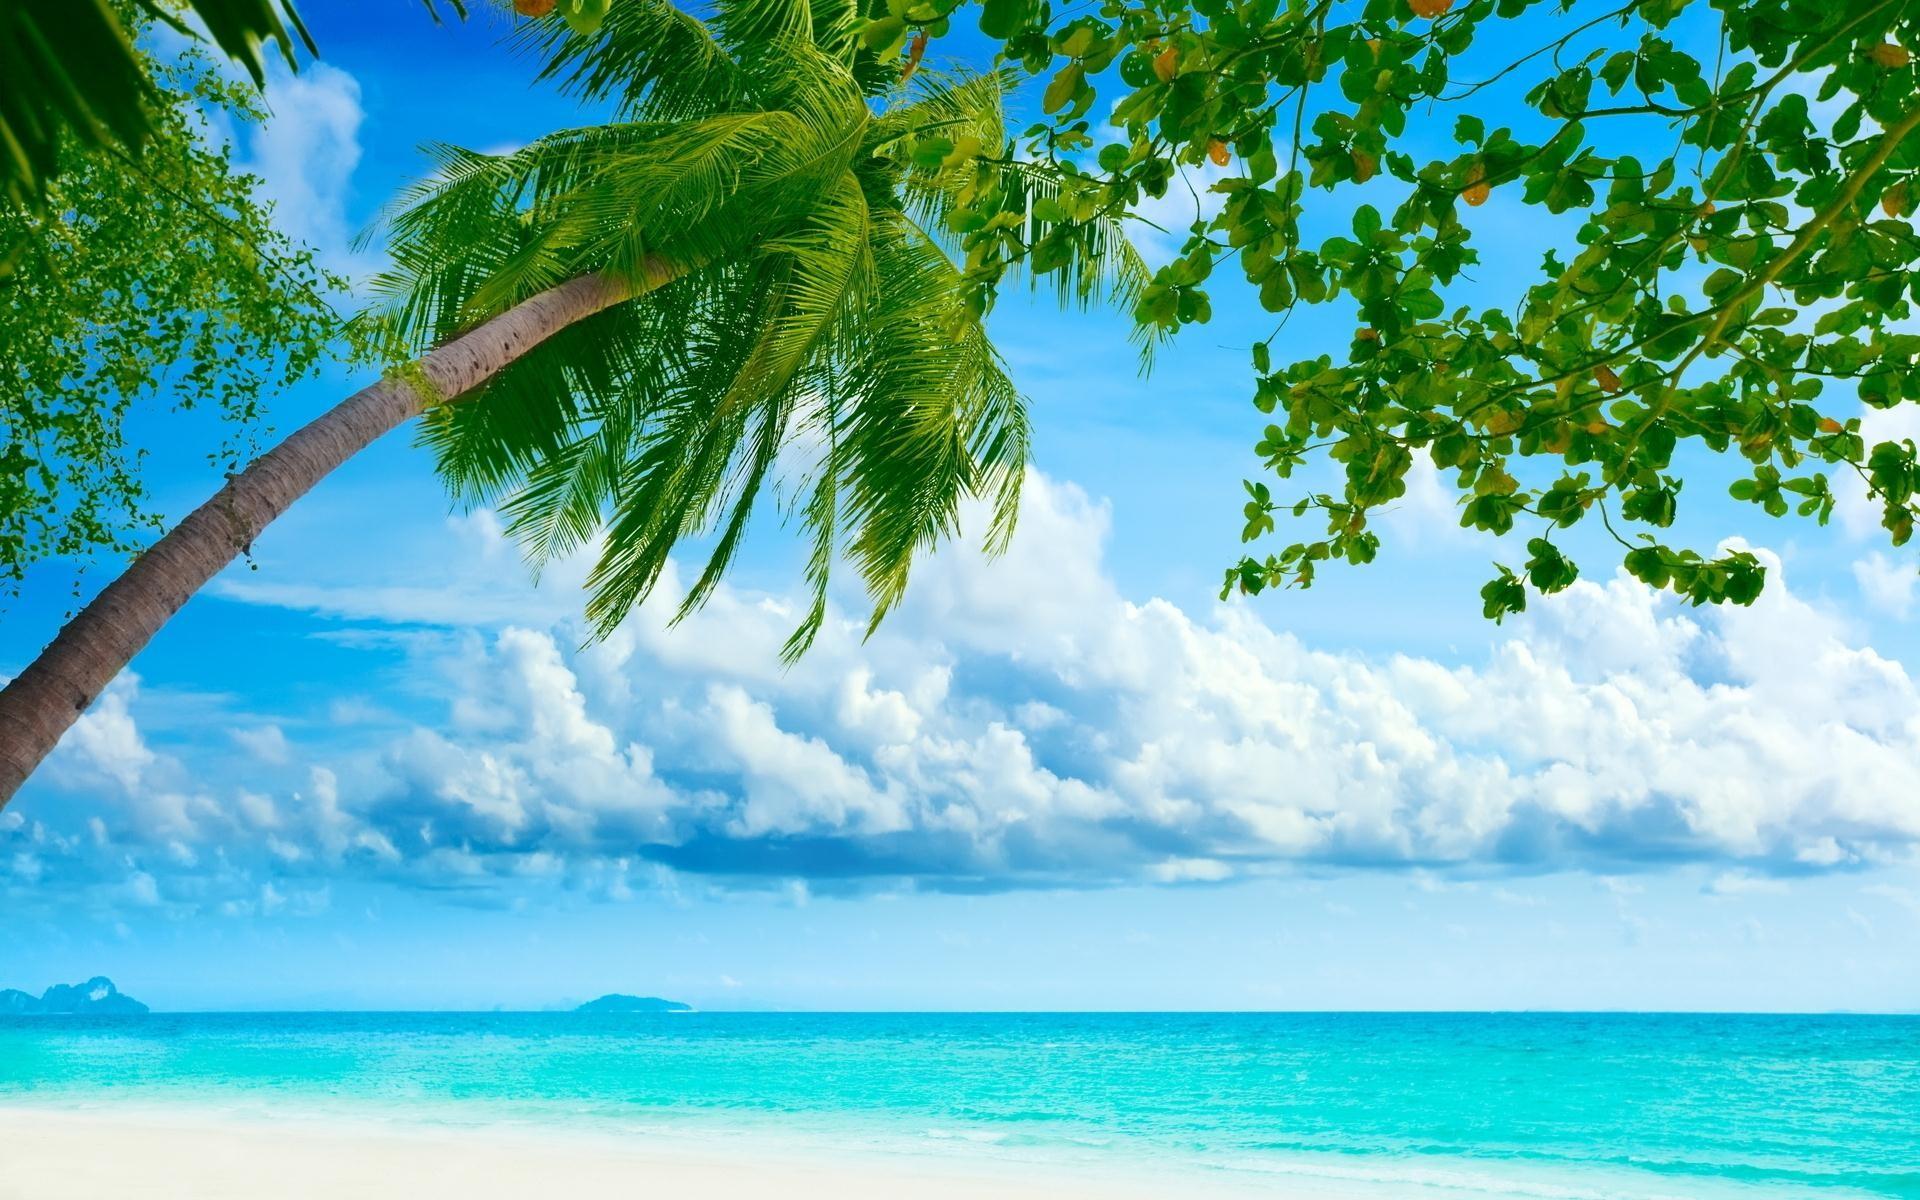 Explore and share Tropical Island Desktop Wallpaper on WallpaperSafari